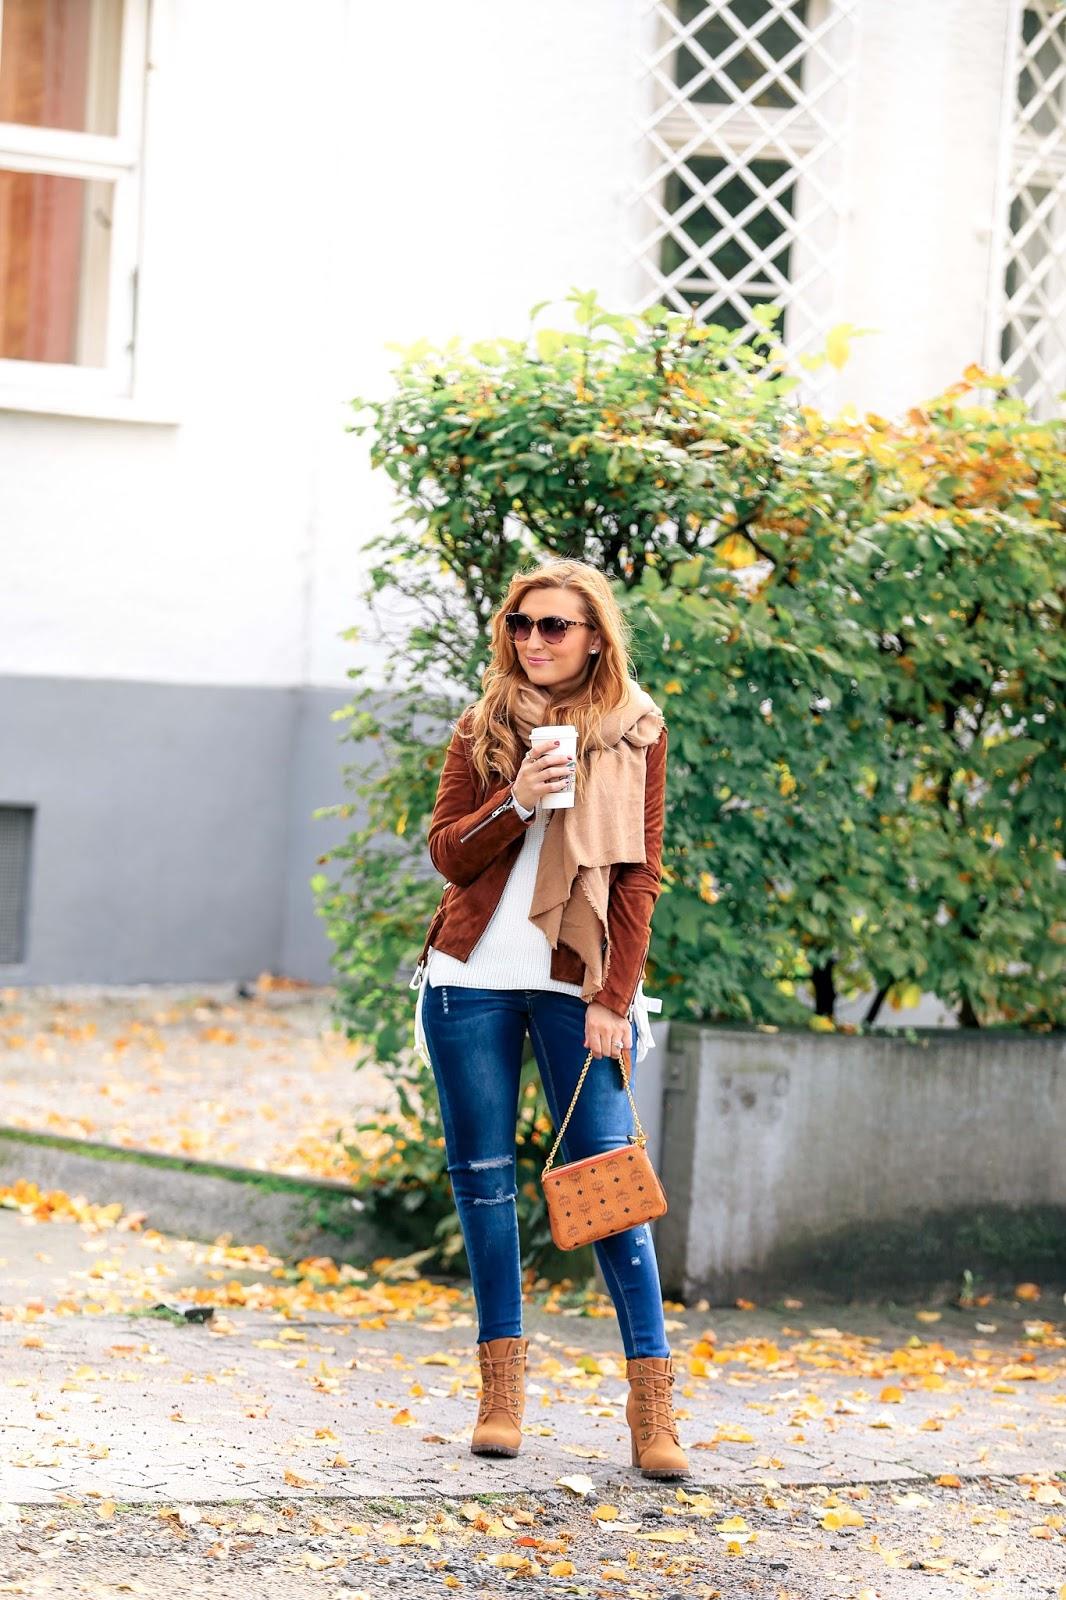 Braune-lederjacke-Fashionstylebyjohanna-blogger-Frankfurt-deutschlandfashionblog-outfit-ootd-Boots-zum-schnüren-hmtrend-beige-altrosa-oversize-cardigan-khaki-jeans-MCM-Tasch